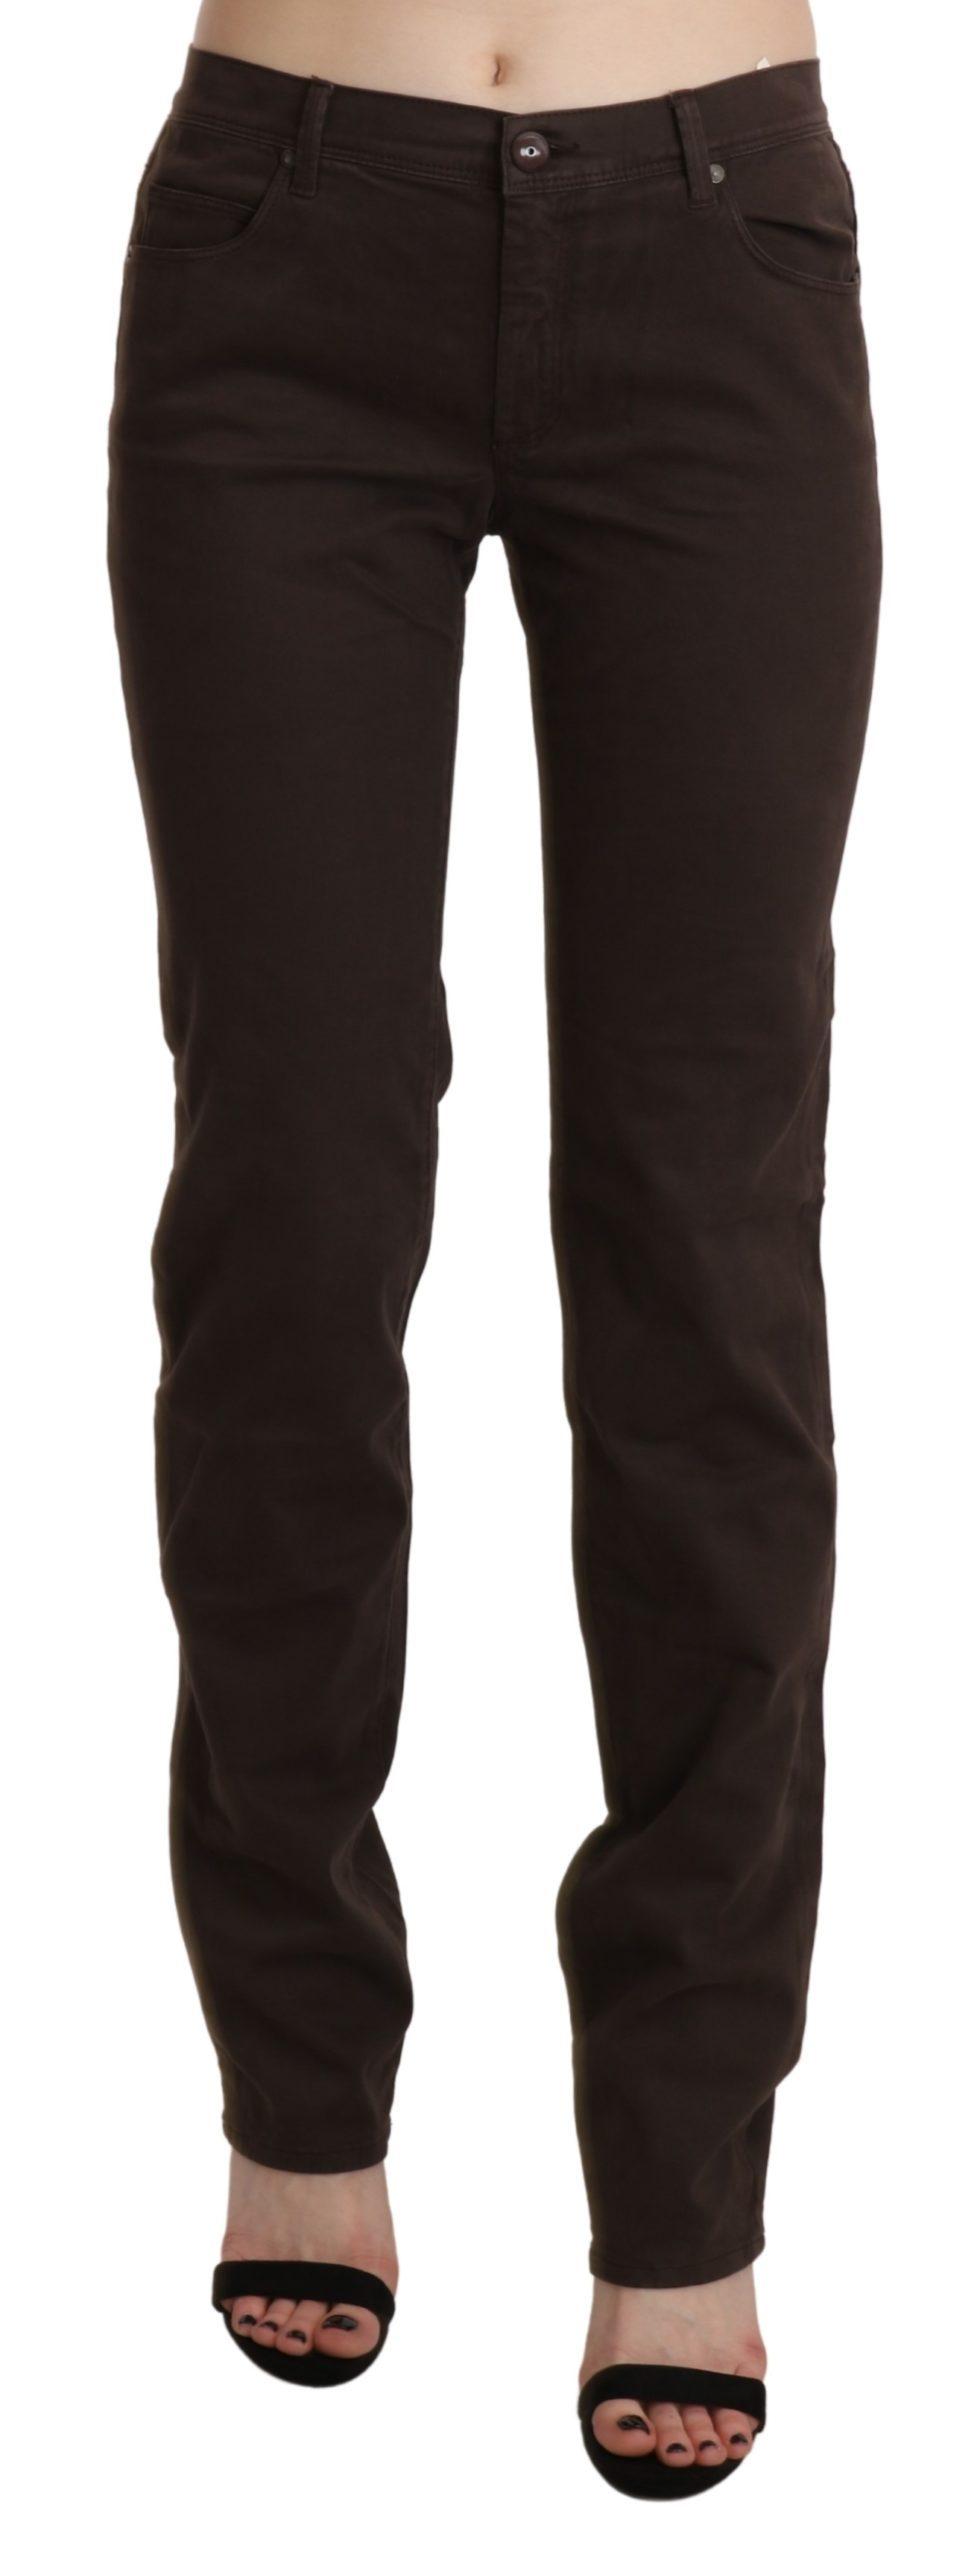 Brown Mid Waist Skinny Slim Trouser Cotton Jeans - W32